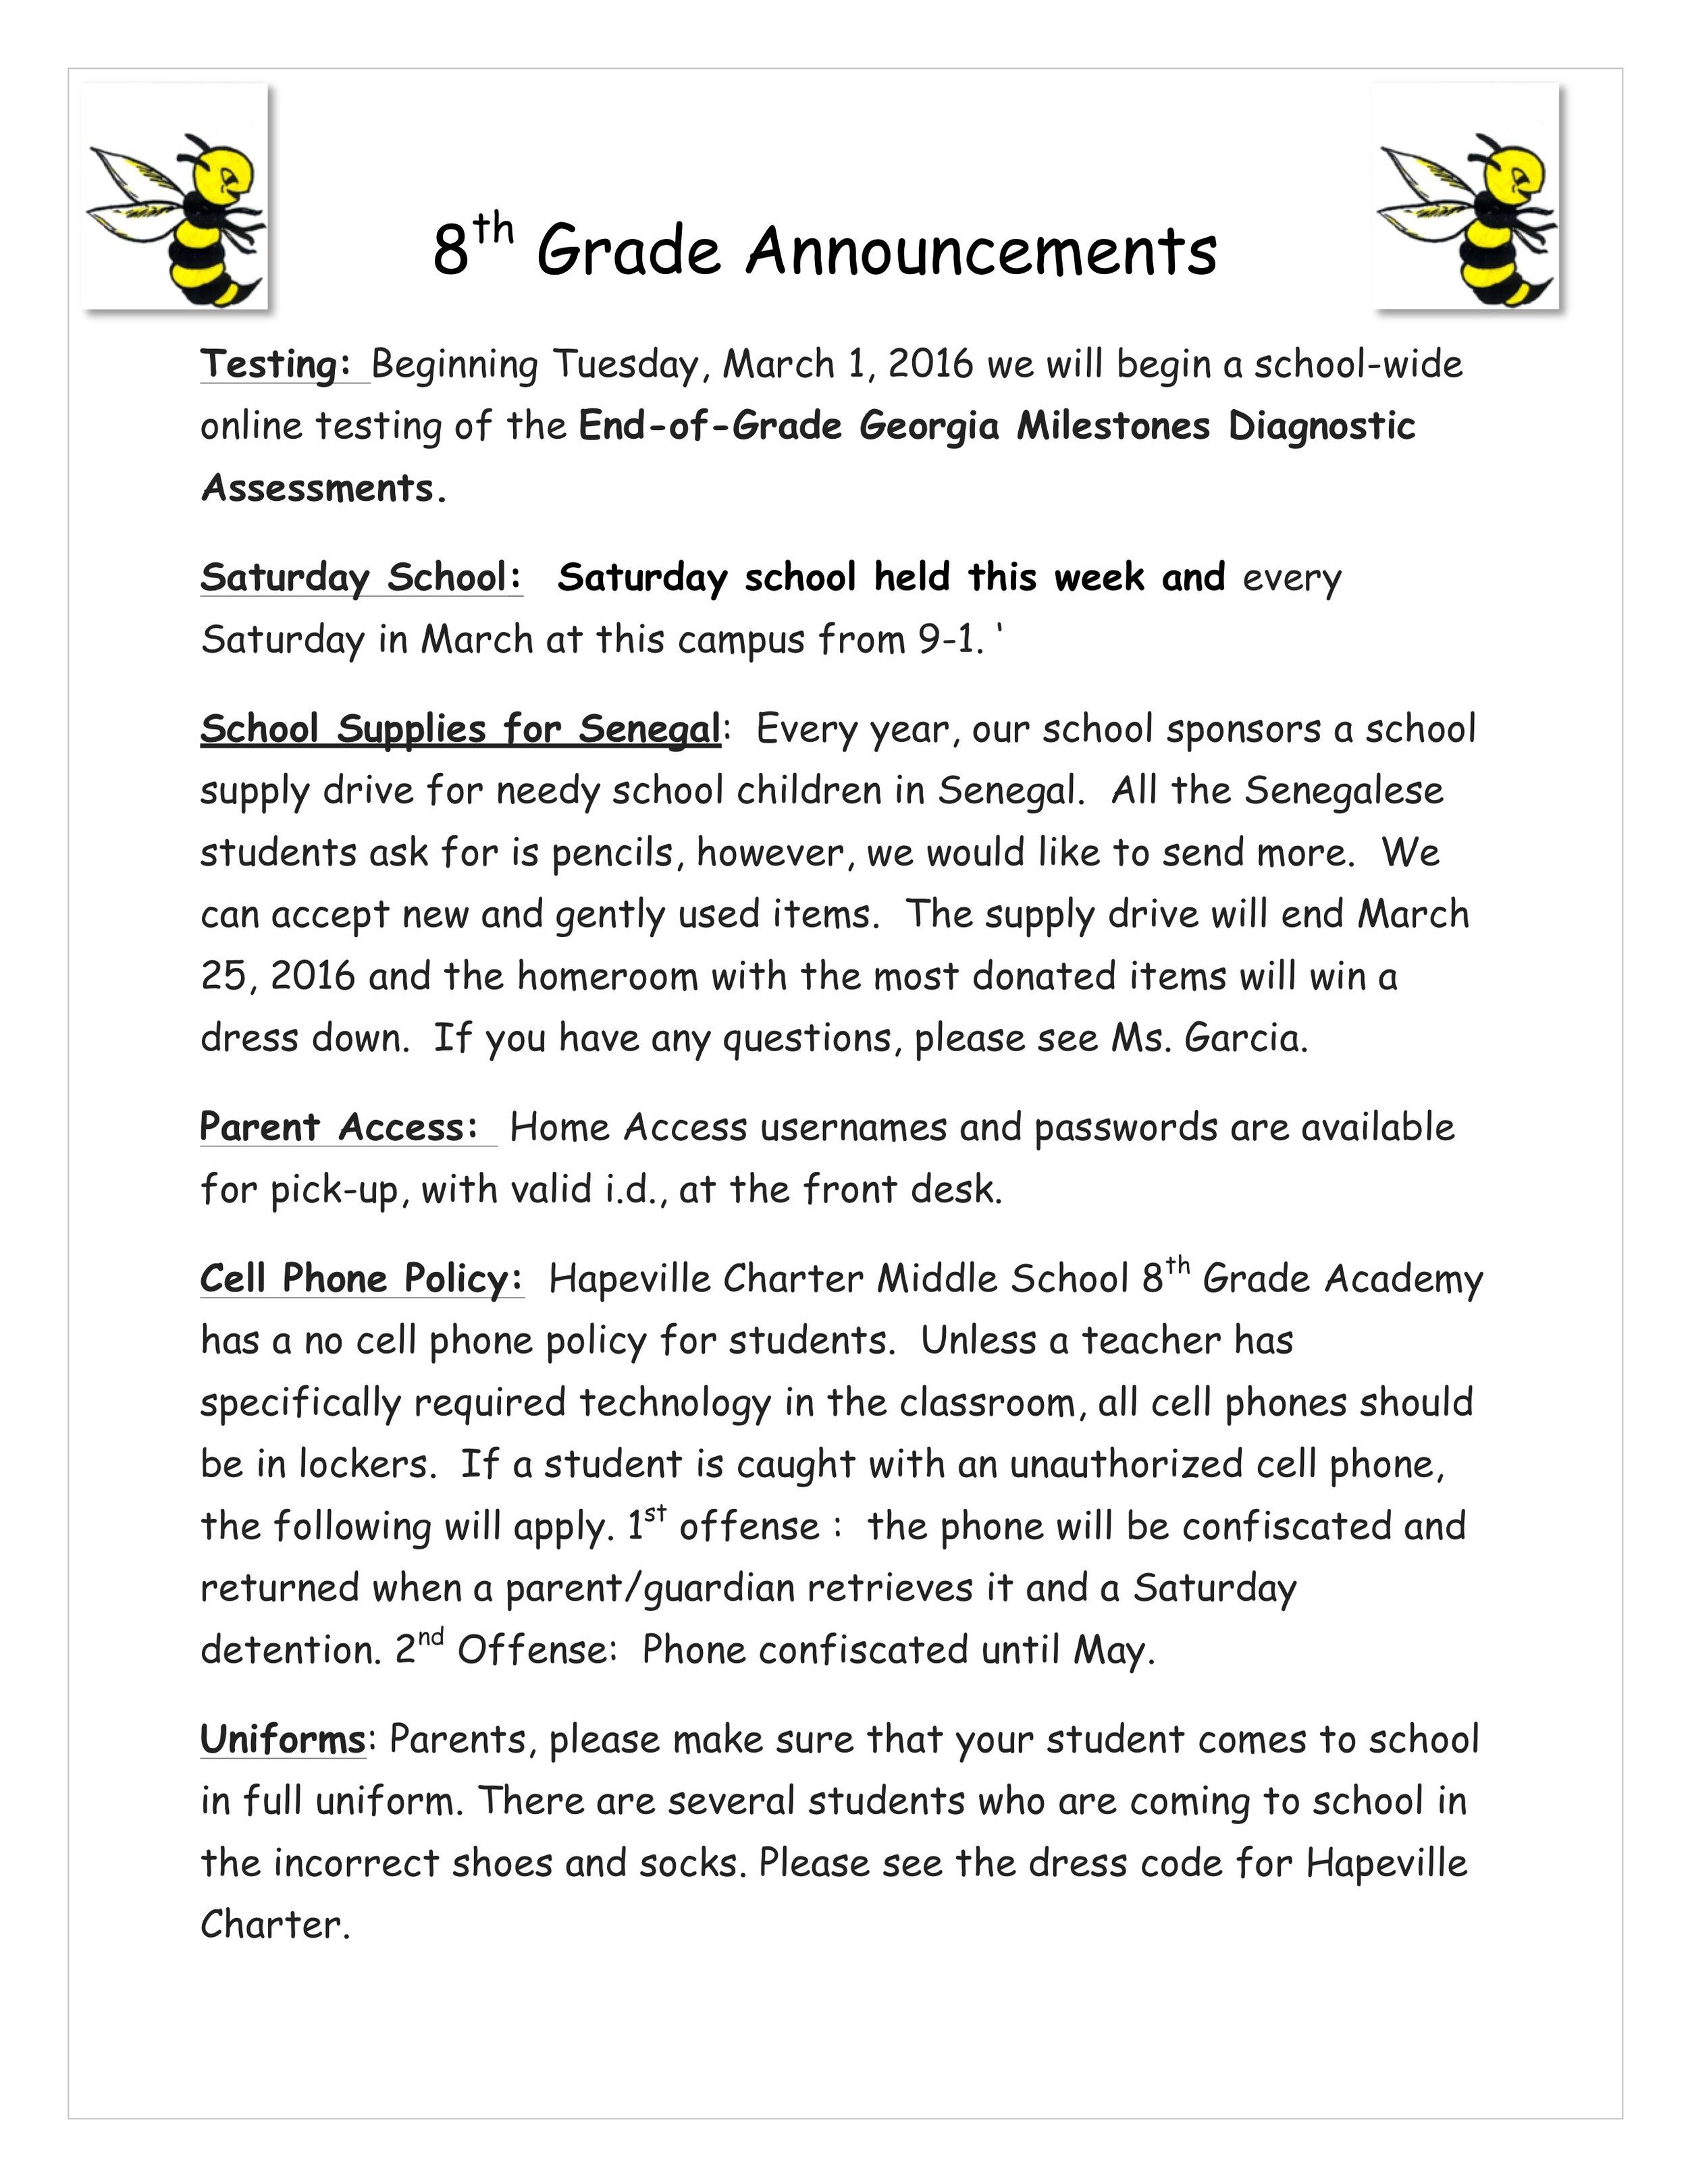 February 29, 2016 Newsletter 8th Grade 2pdf-image.jpeg